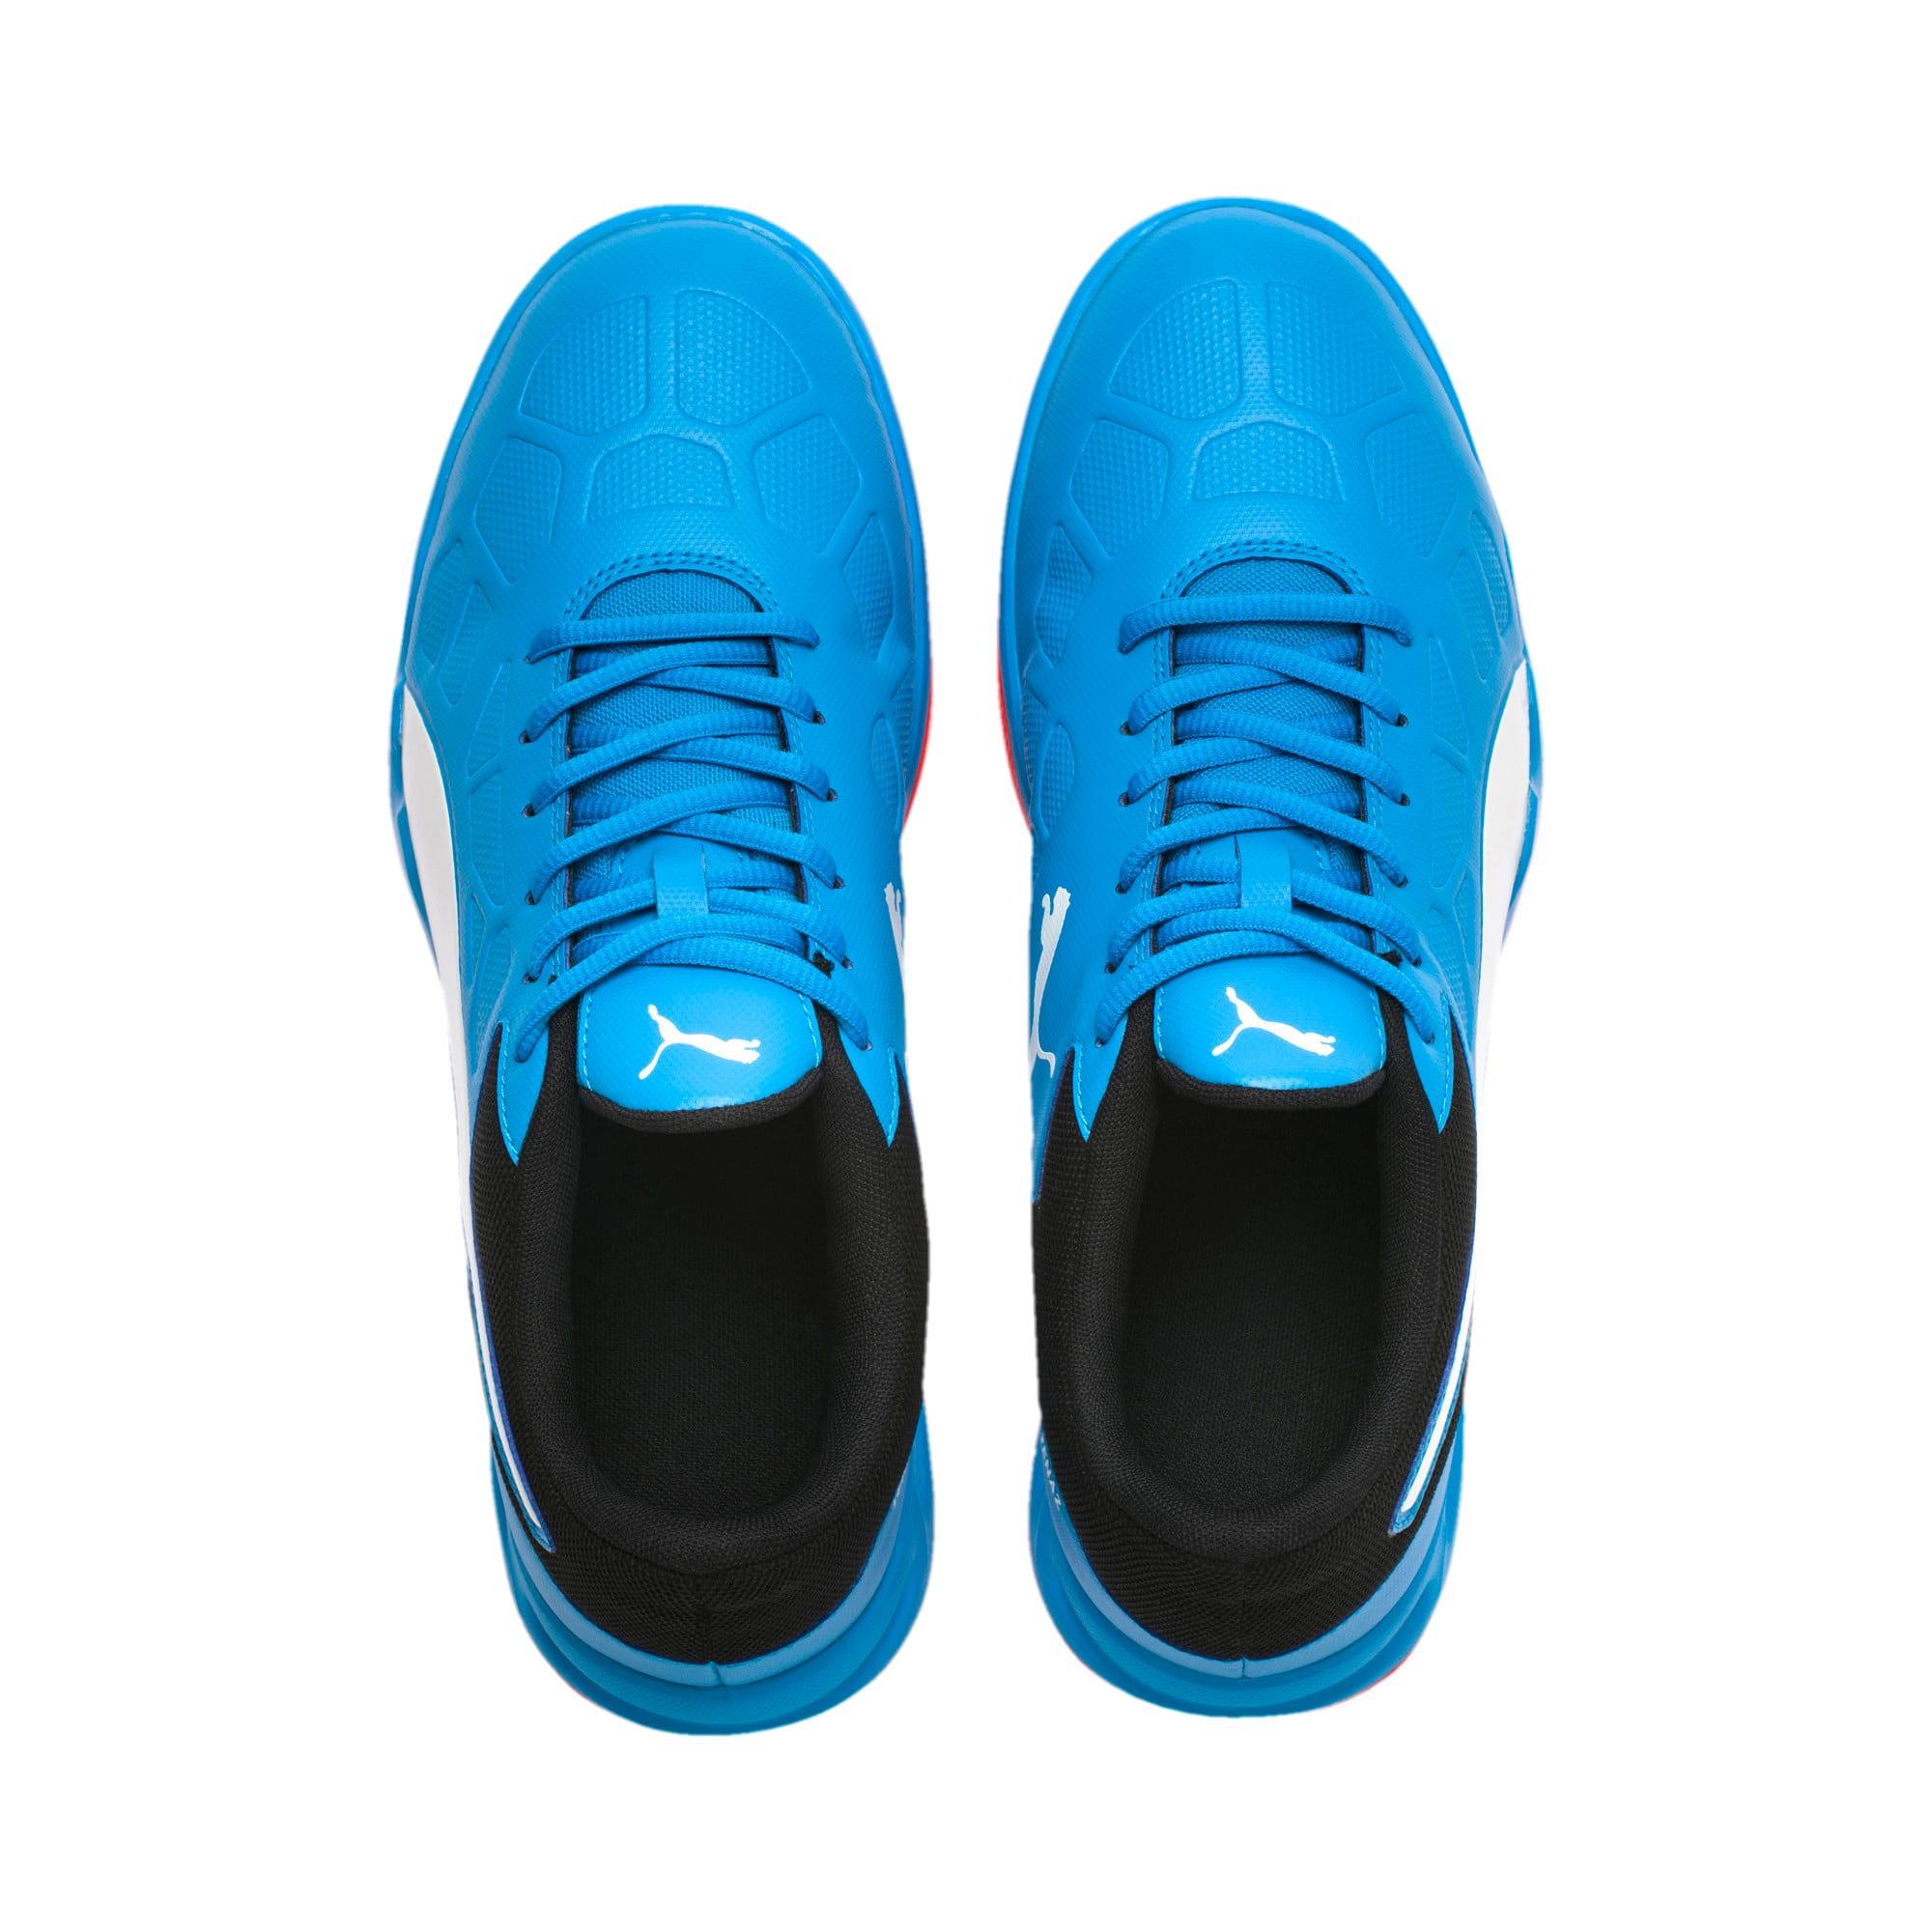 Thumbnail 2 of Tenaz Indoor Teamsport Shoes, Bleu Azur-White-Black-Red, medium-IND